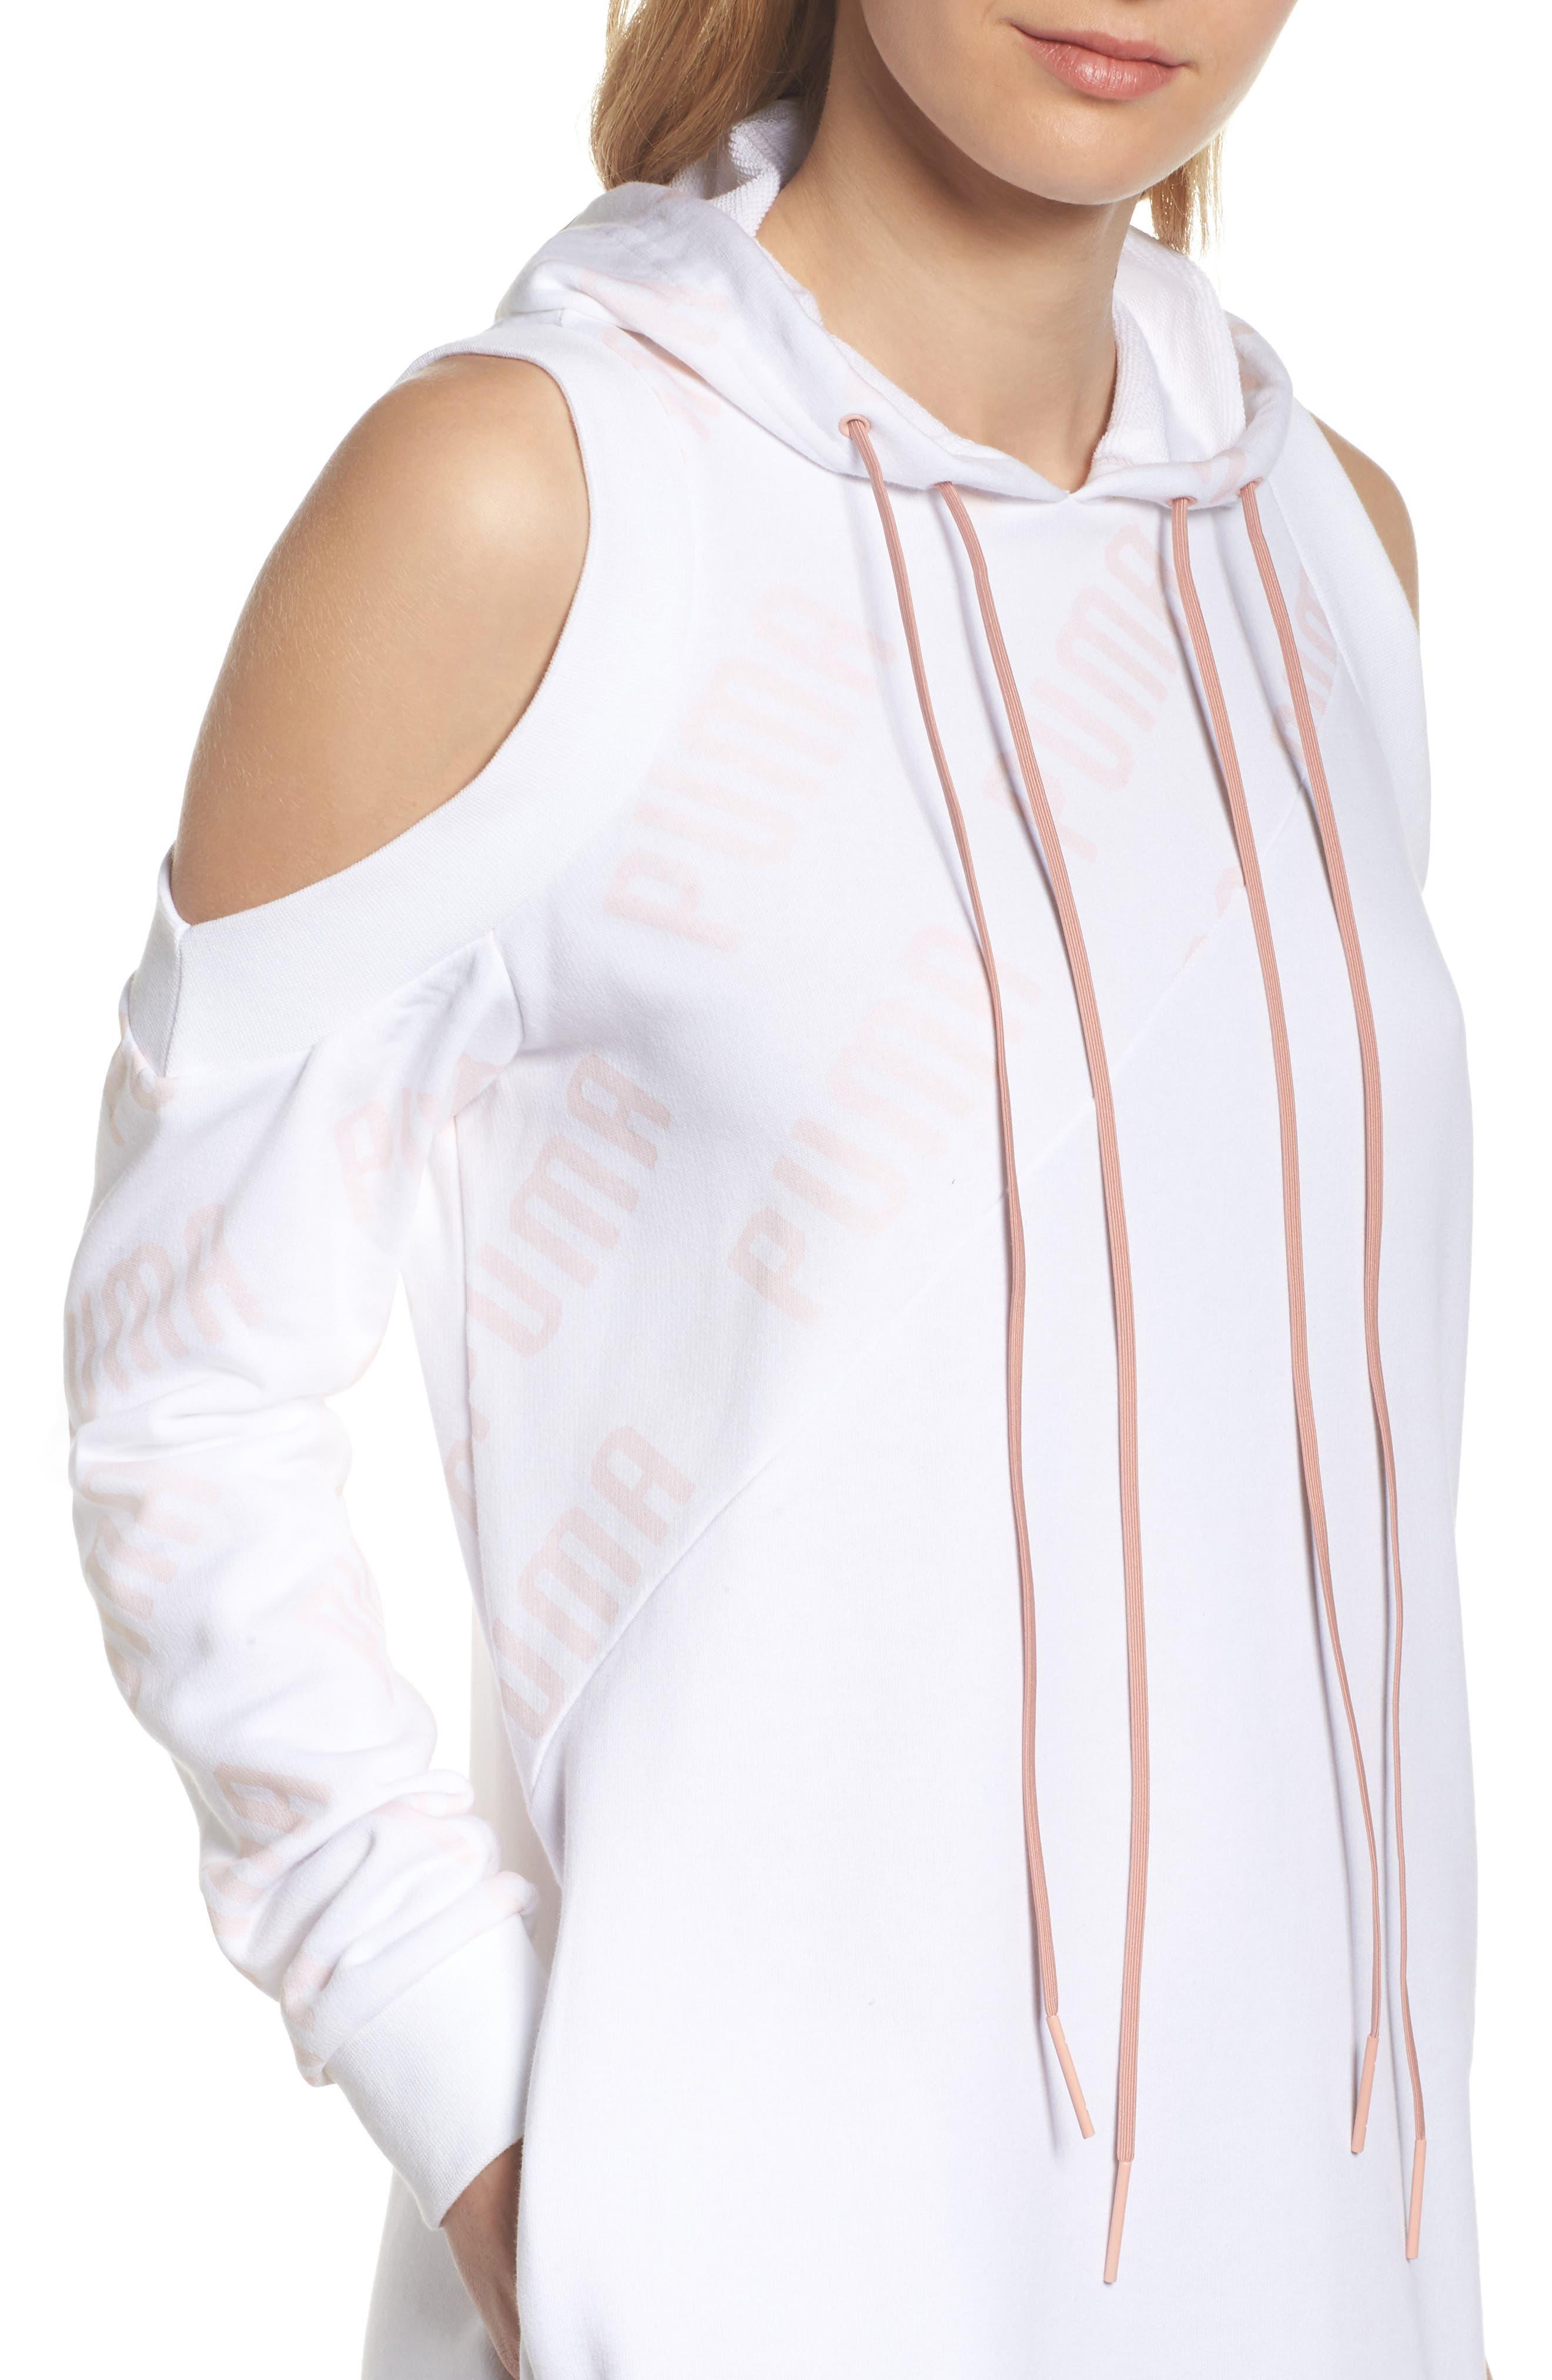 En Pointe Drawstring Dress,                             Alternate thumbnail 4, color,                             Puma White